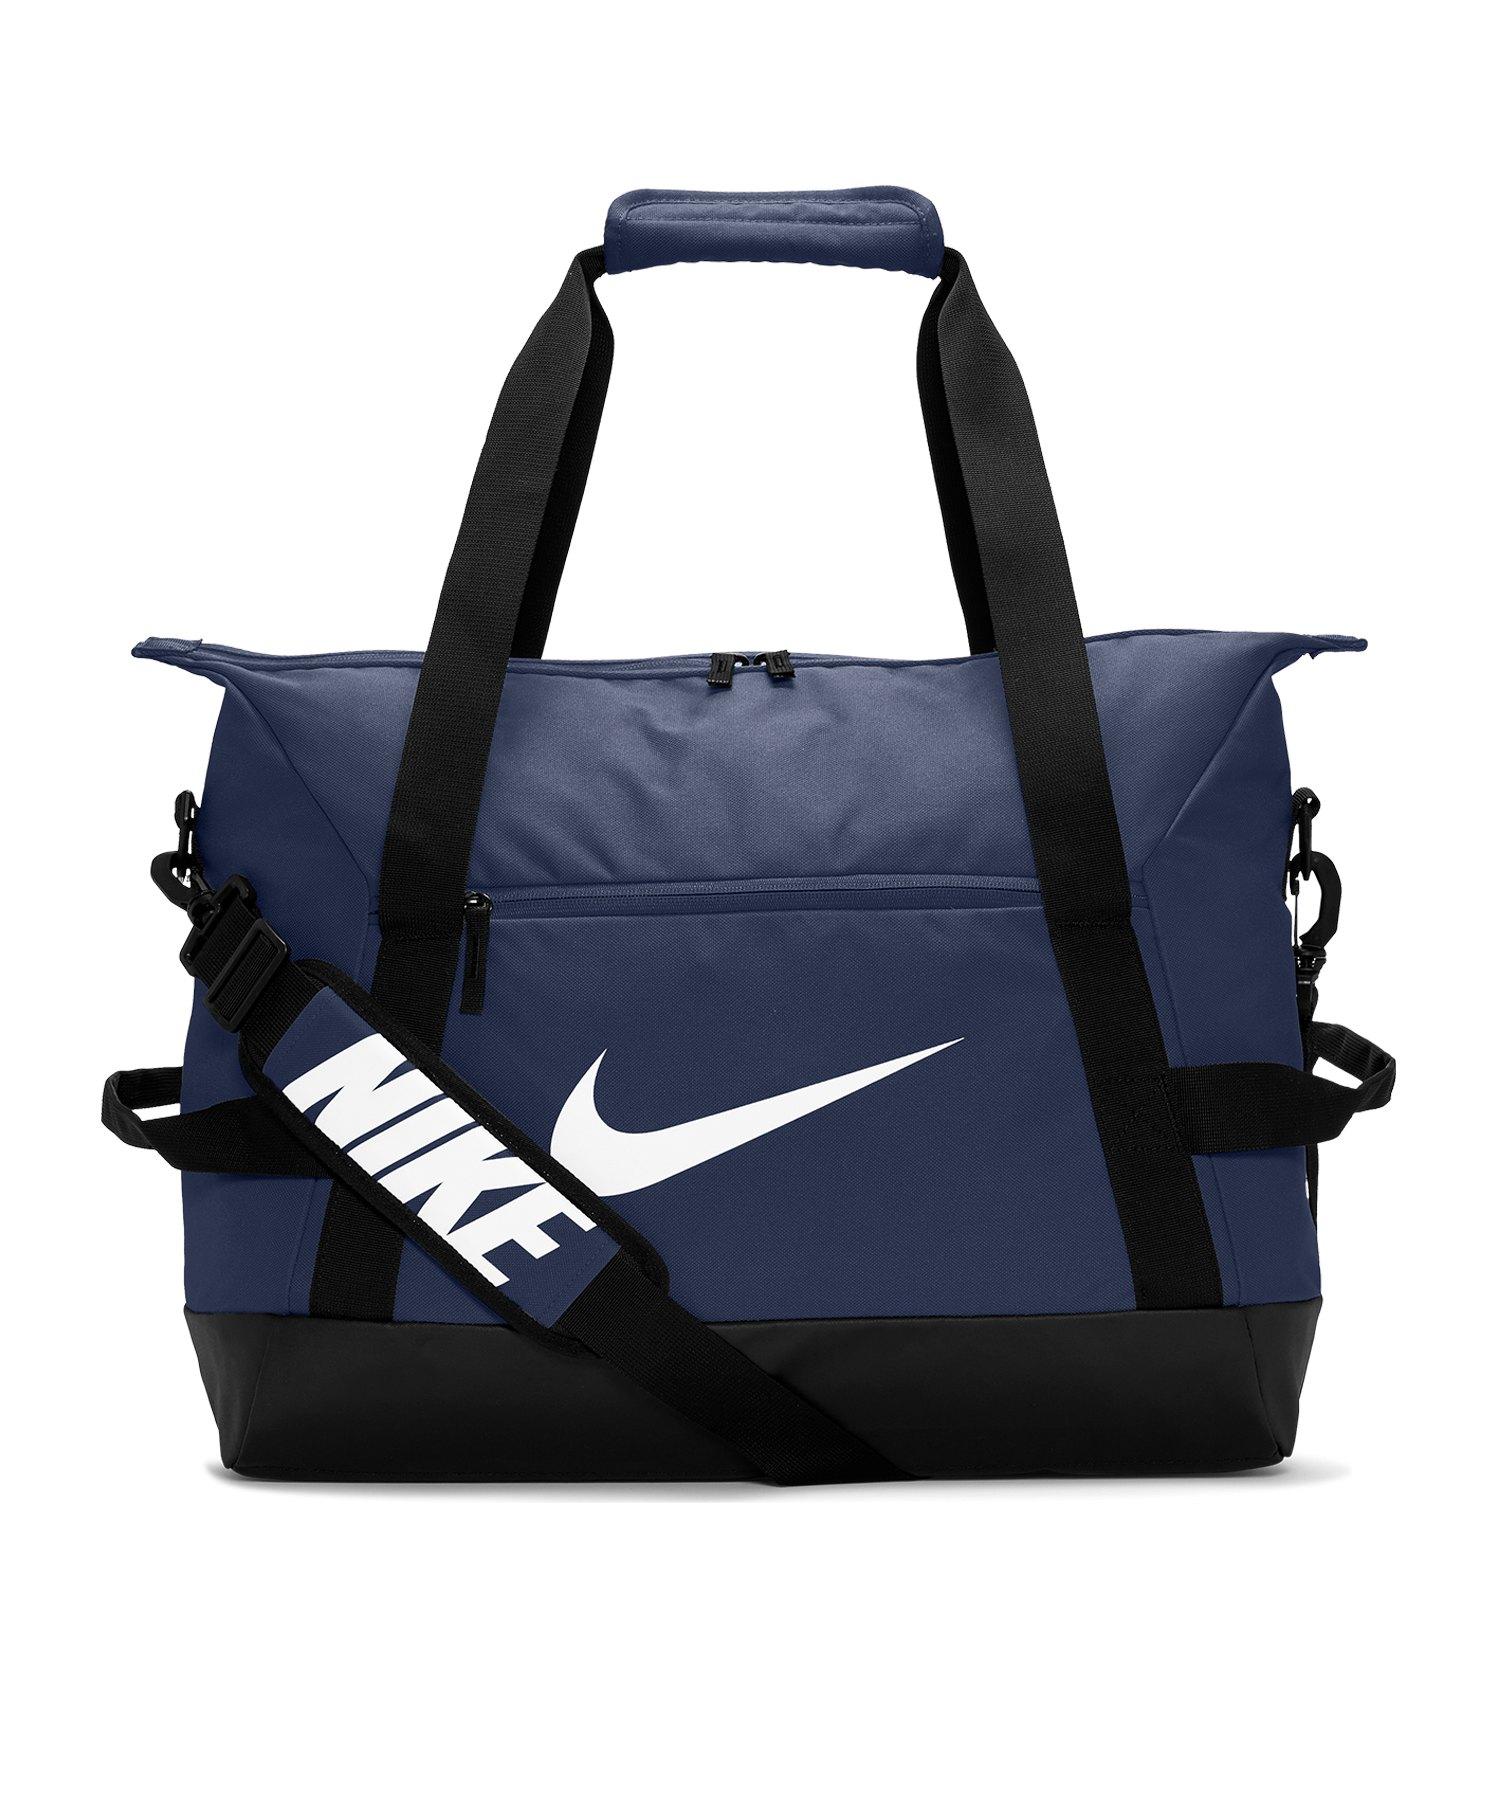 Nike Academy Duffle Tasche Small Blau F410 - blau